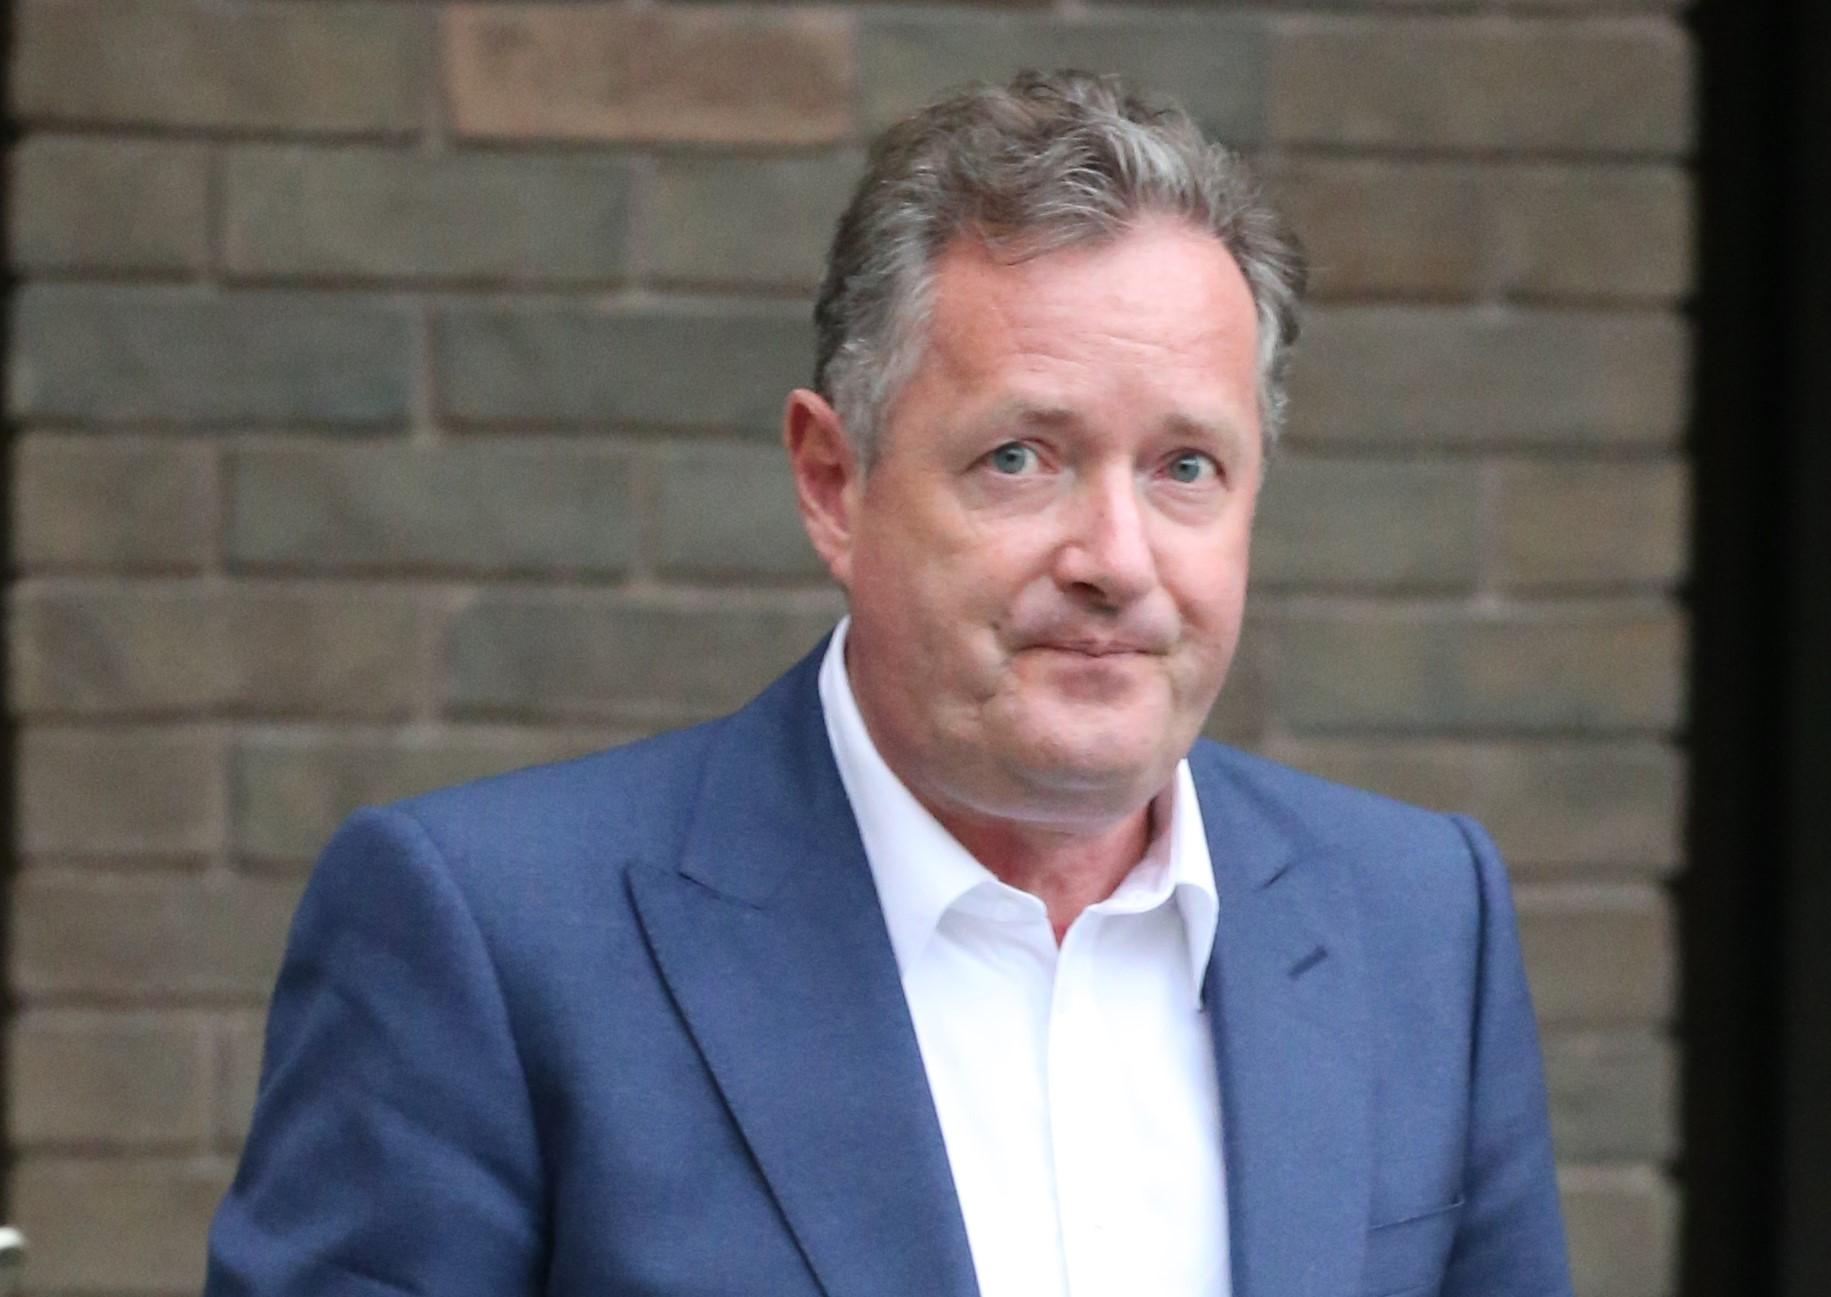 Piers Morgan slams controversial author for wishing coronavirus on Trump's wife